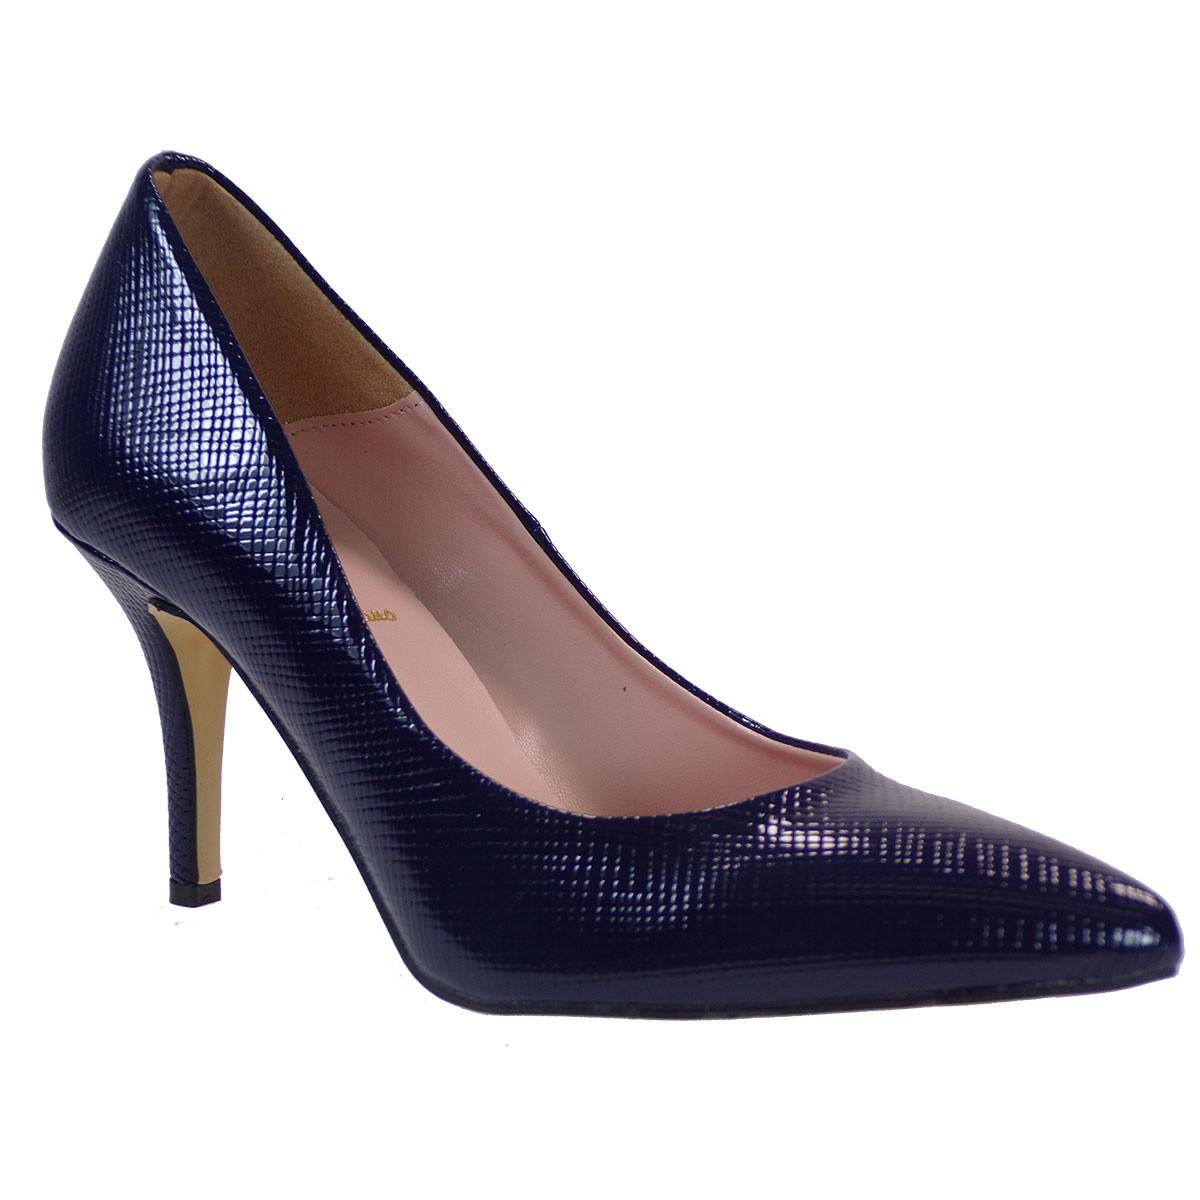 Alessandra Paggioti Γυναικεία Παπούτσια Γόβες 83001 Μπλέ Safione